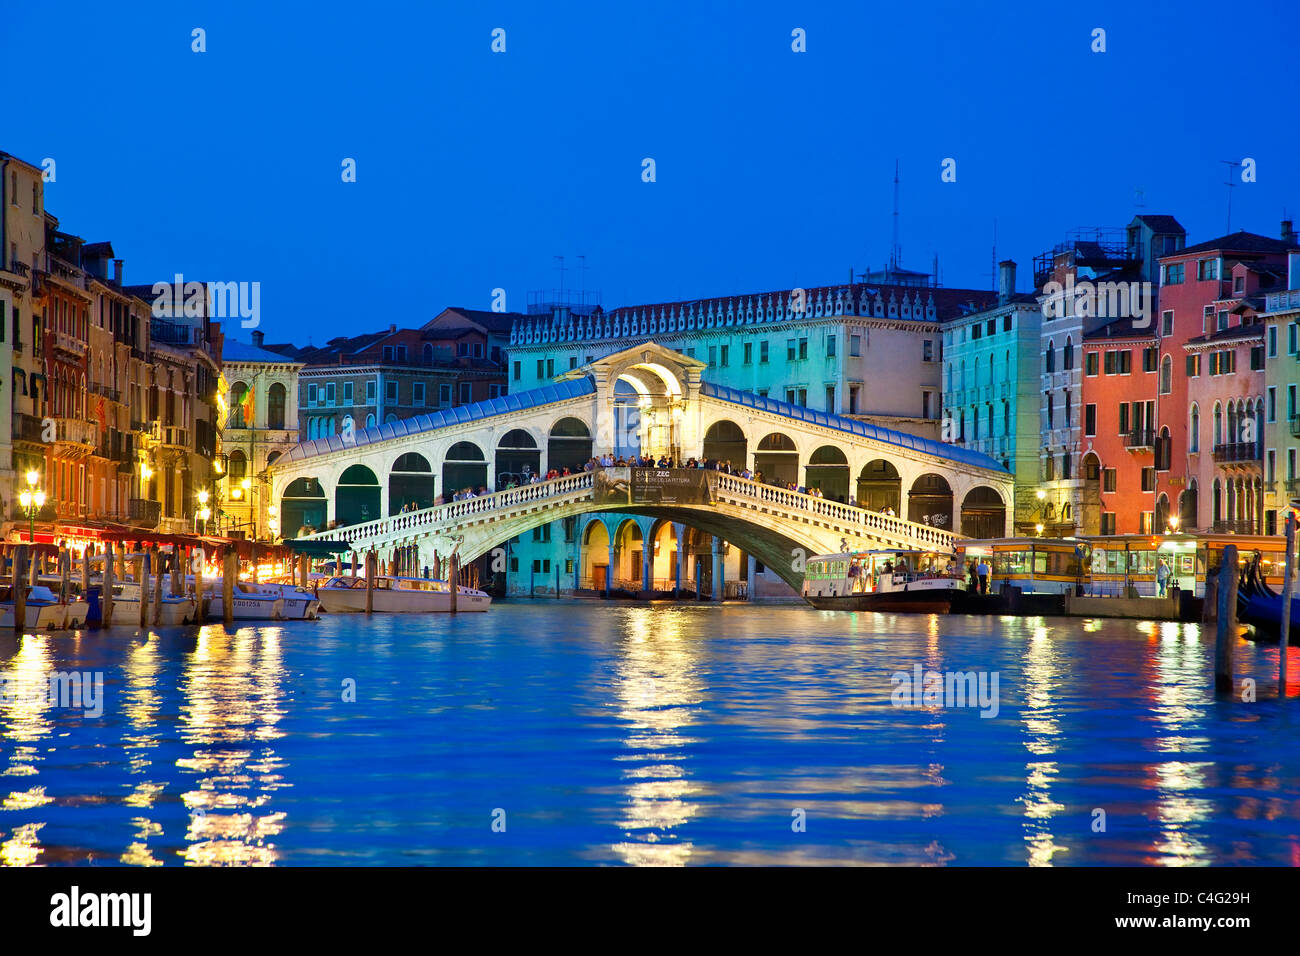 Venedig, die Rialto-Brücke in der Nacht Stockbild